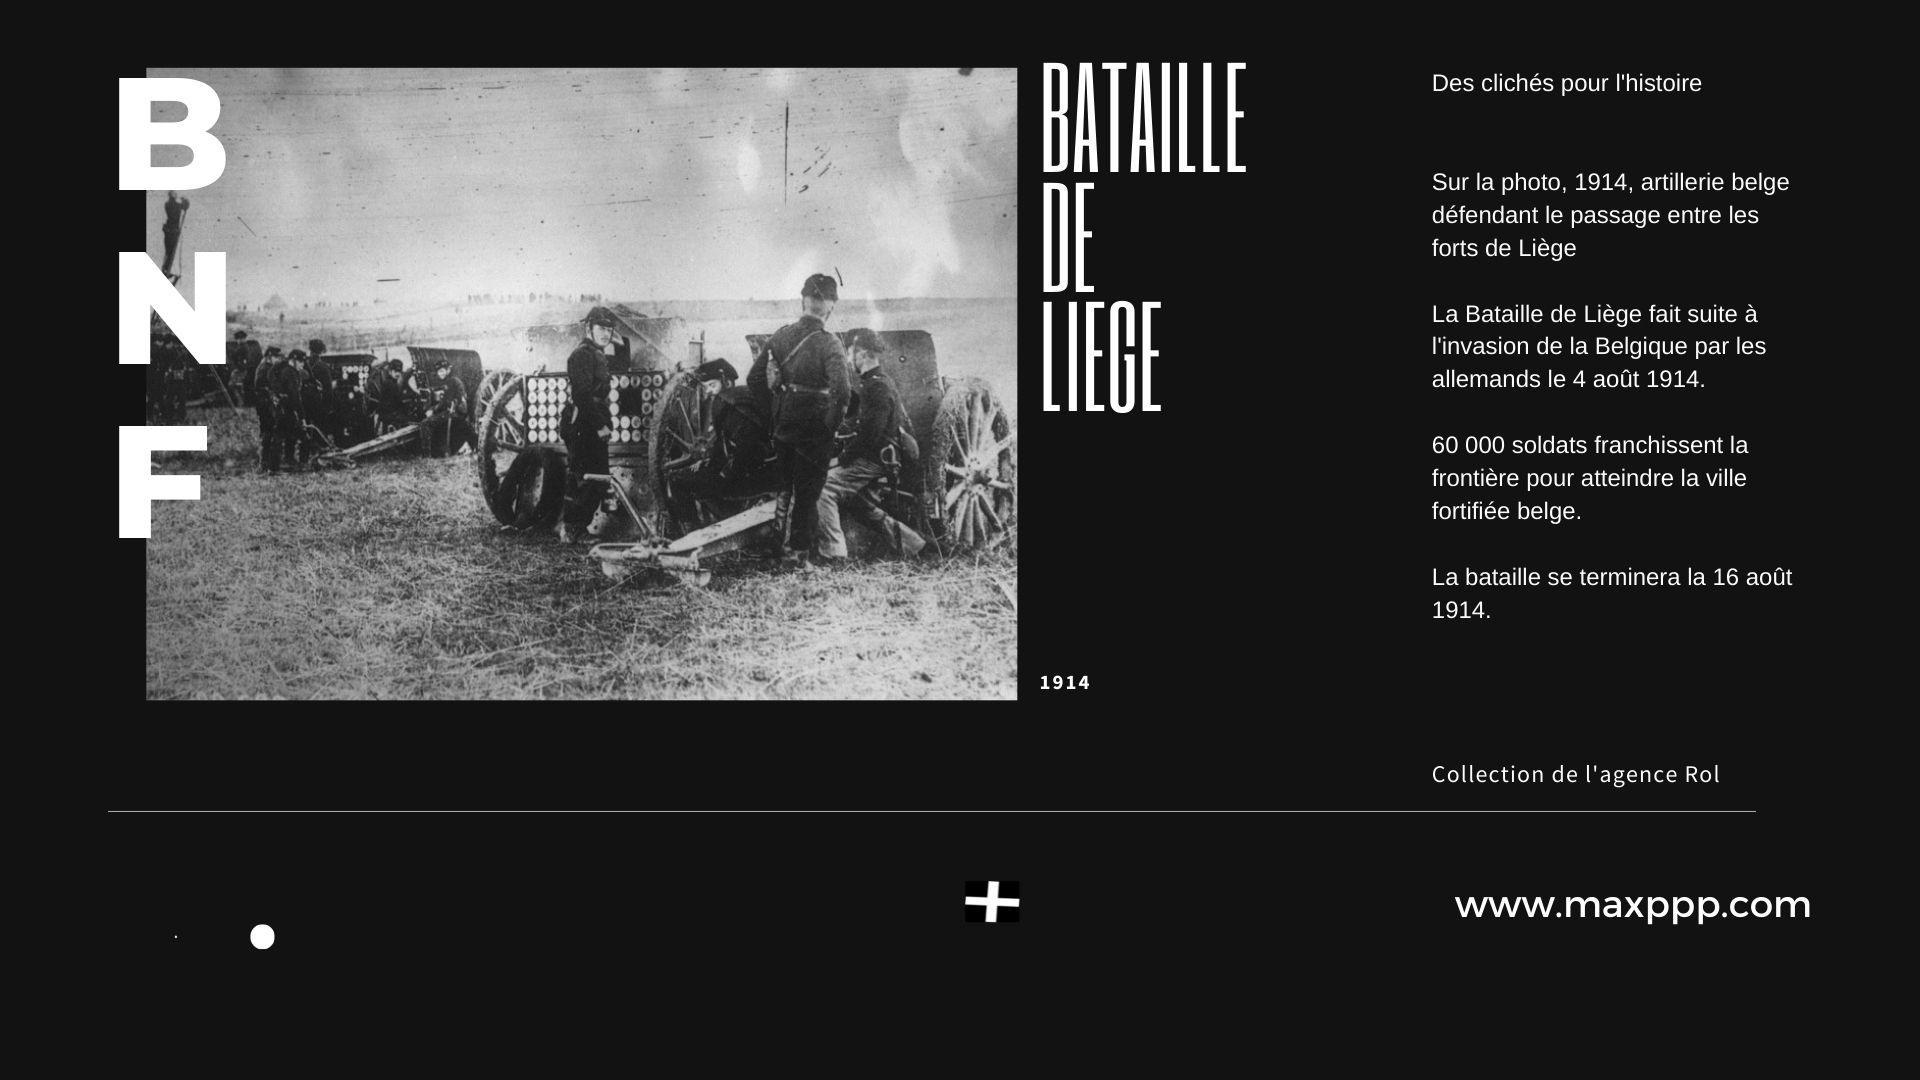 Bataille de Liège, 1914